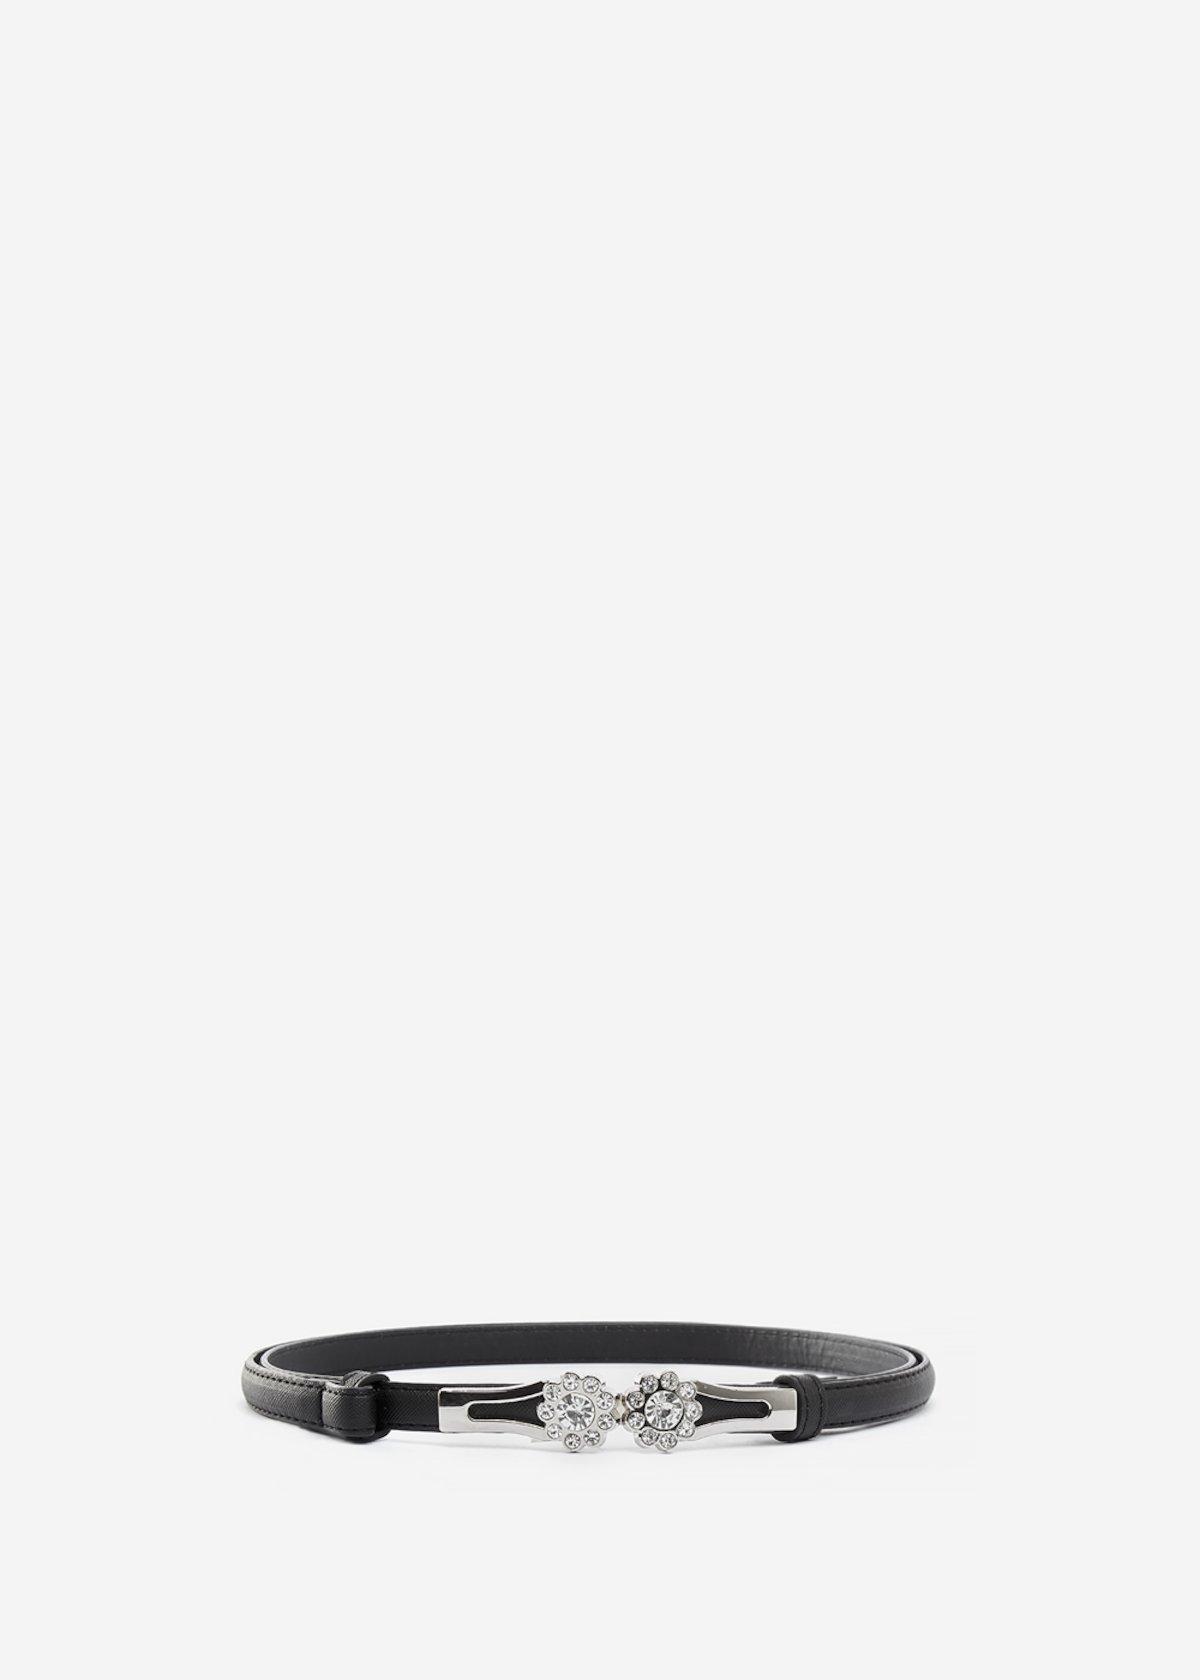 Chiore belt saffiano leather effect - Black